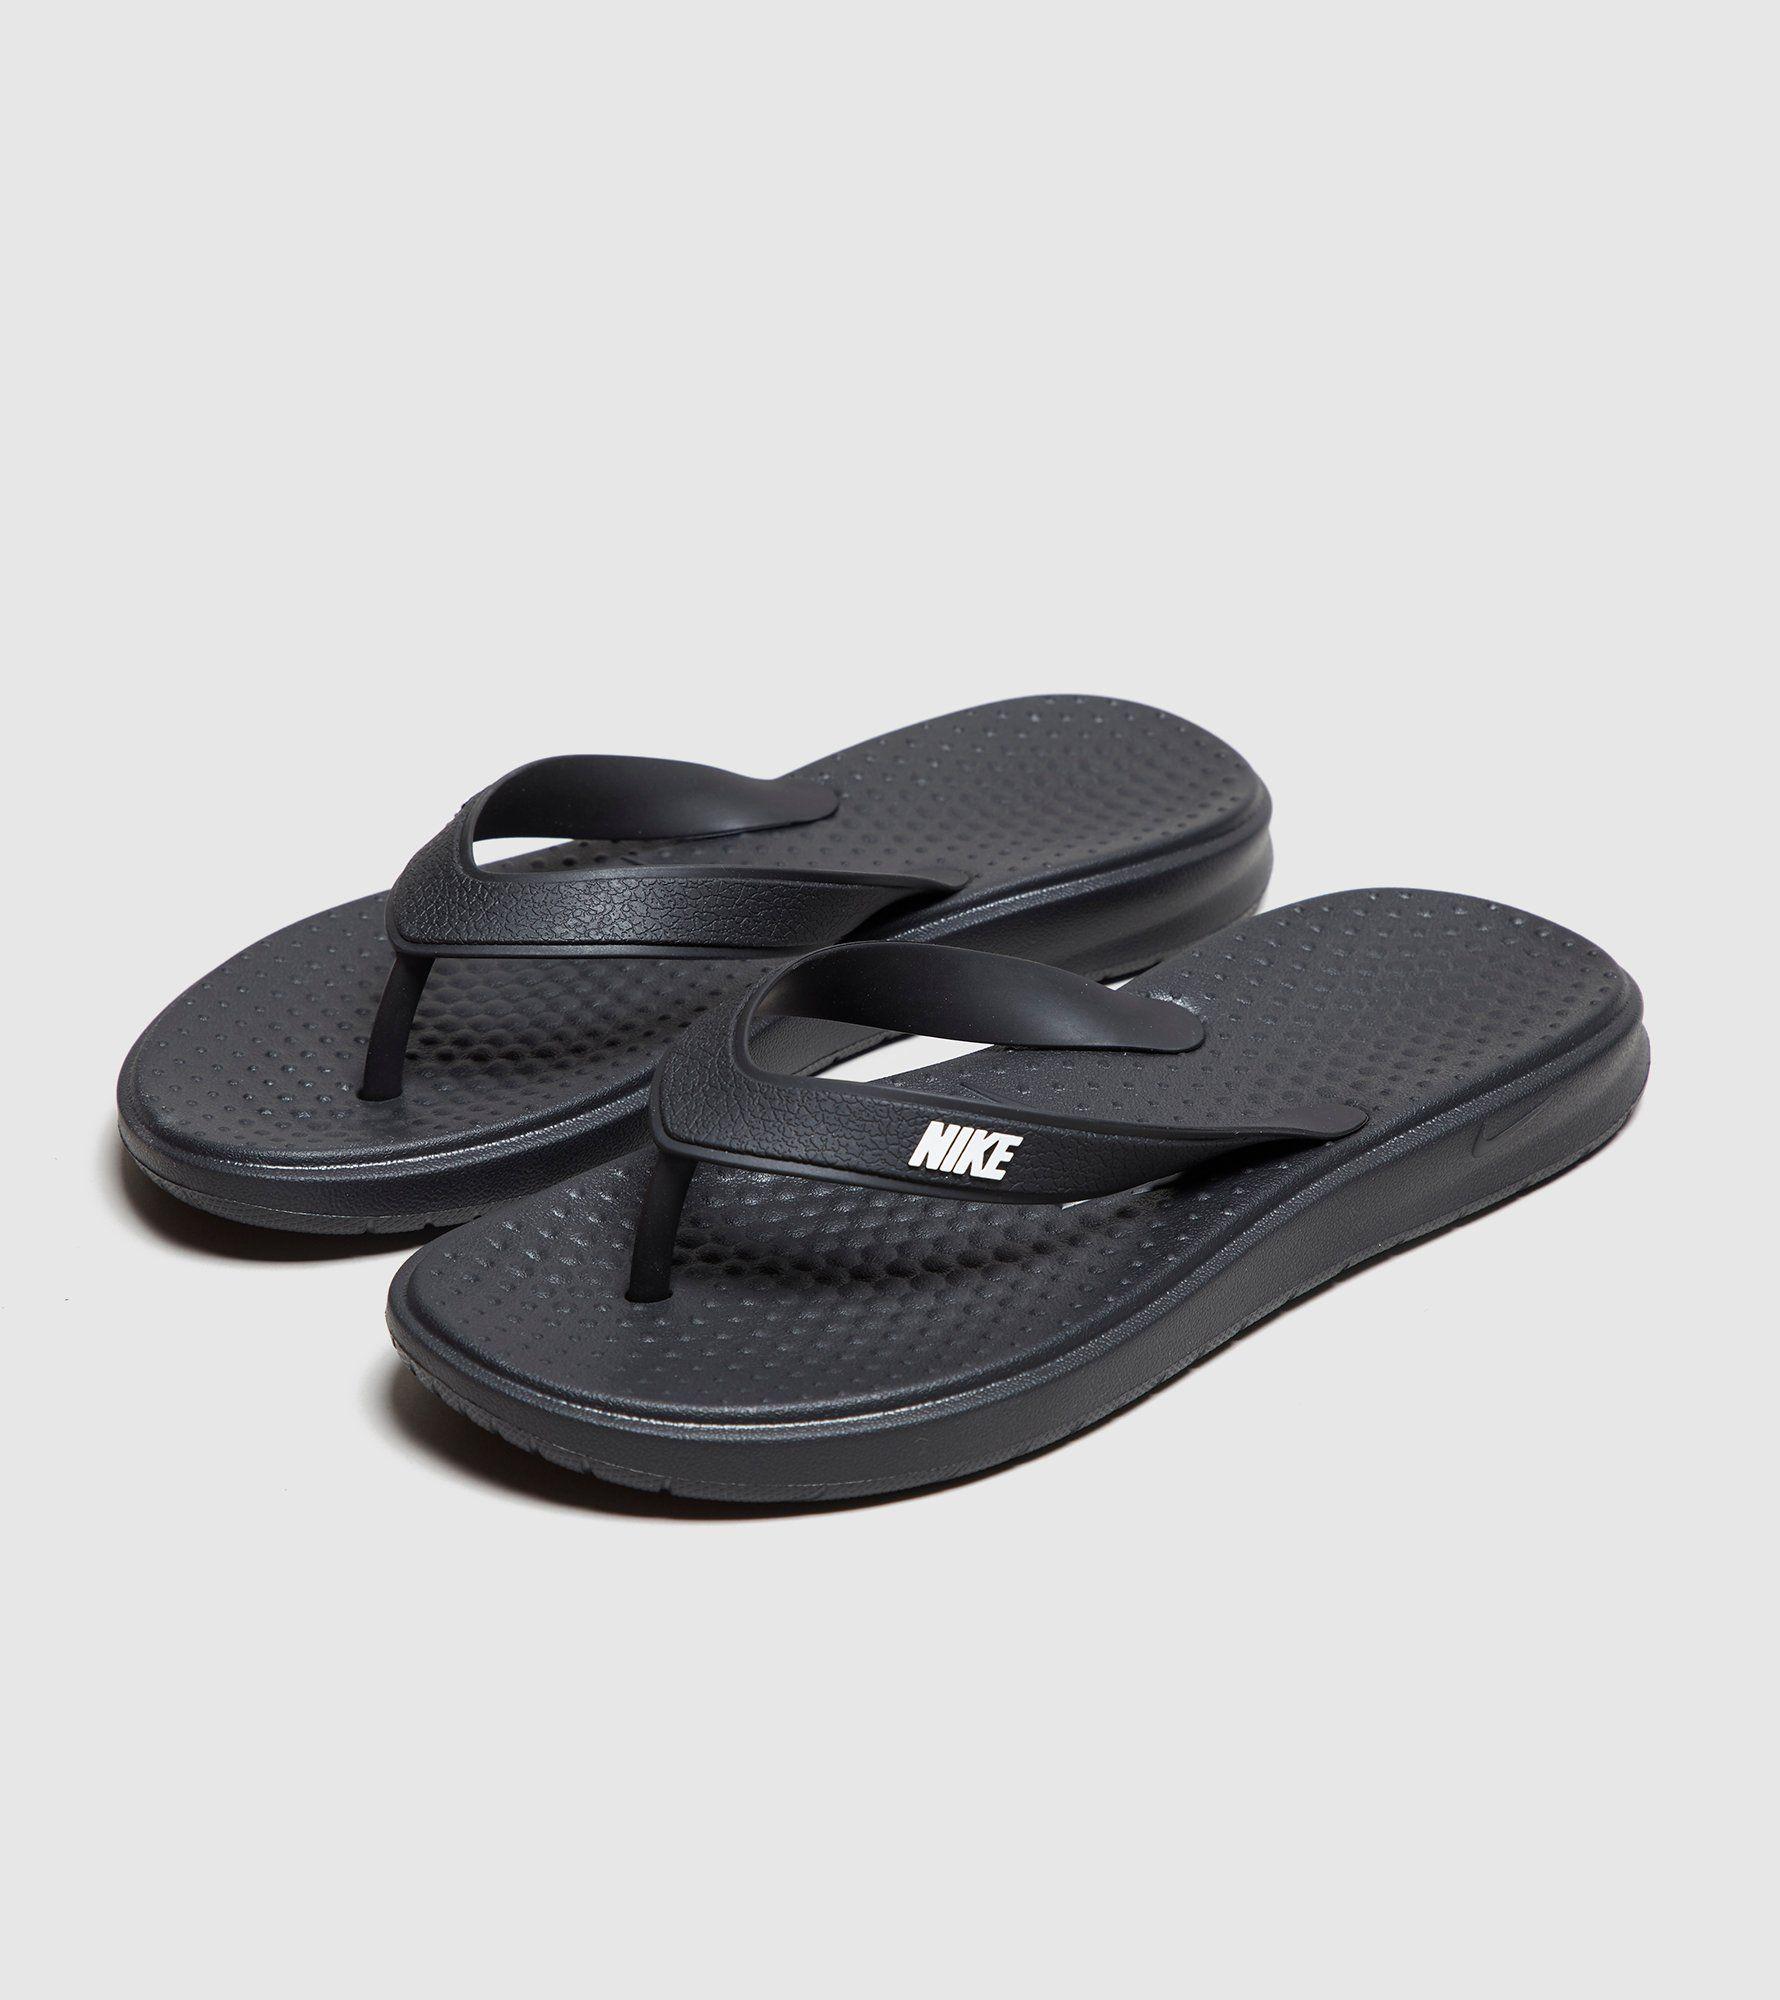 Nike Solay Flip Flop